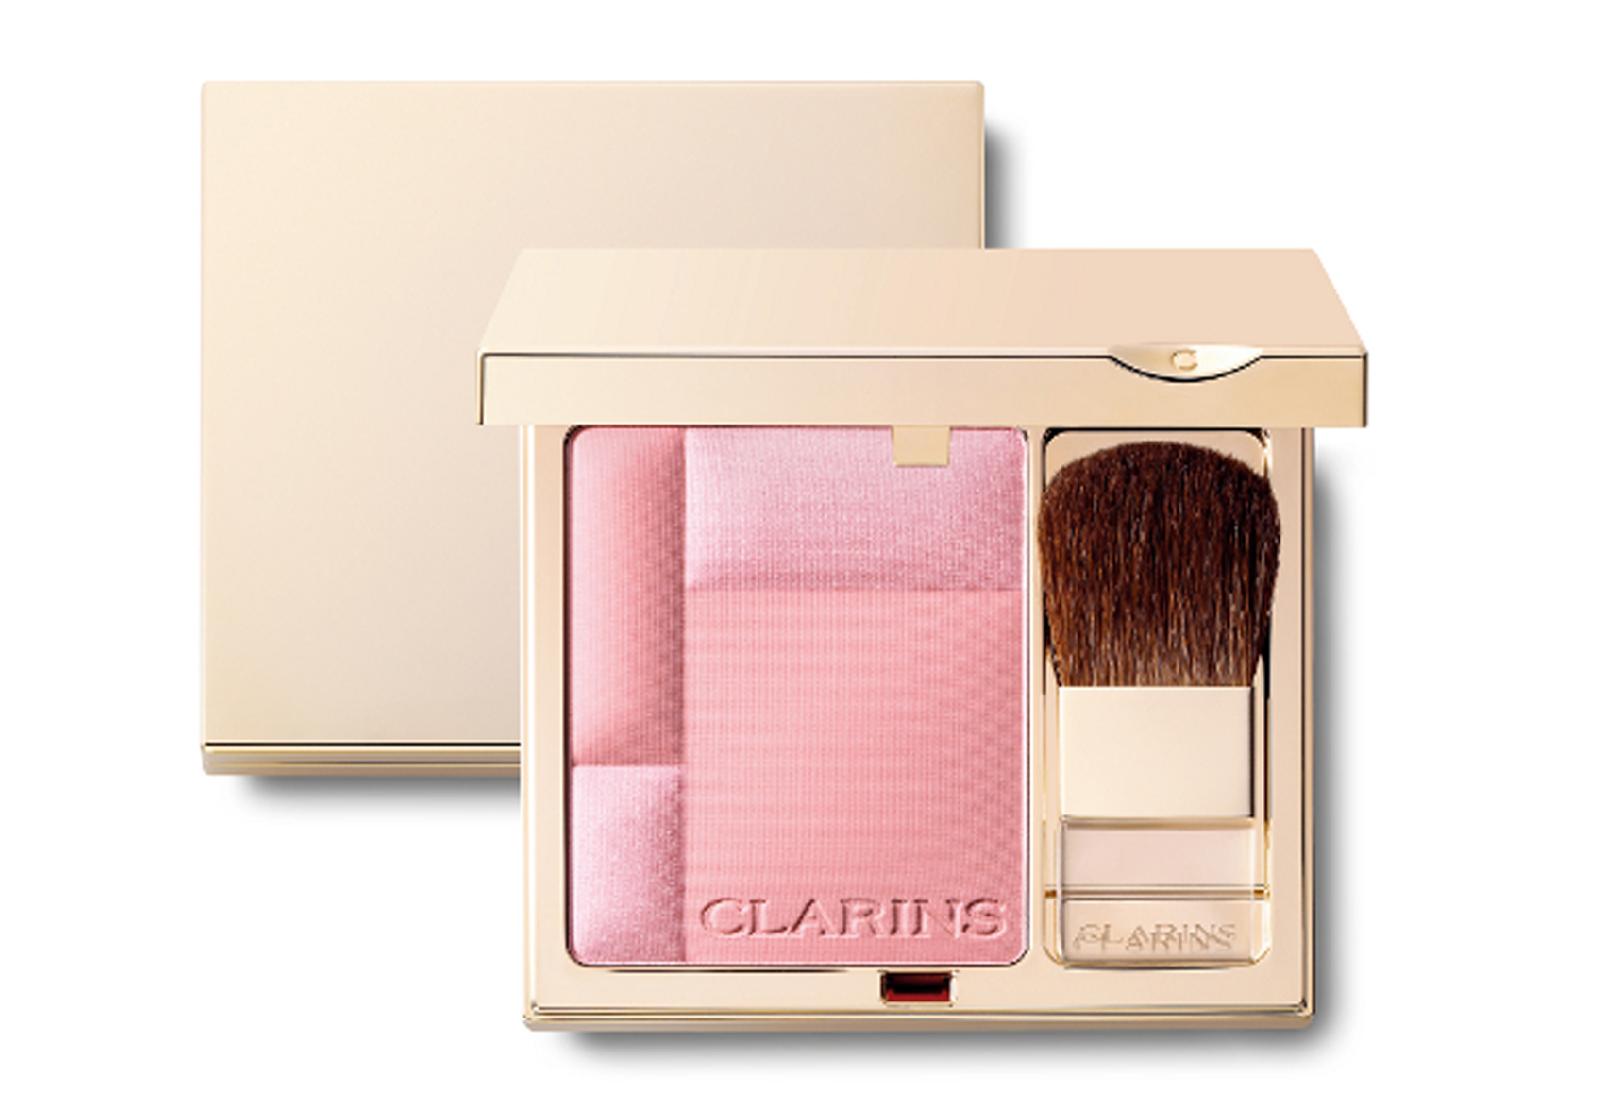 clarins blush